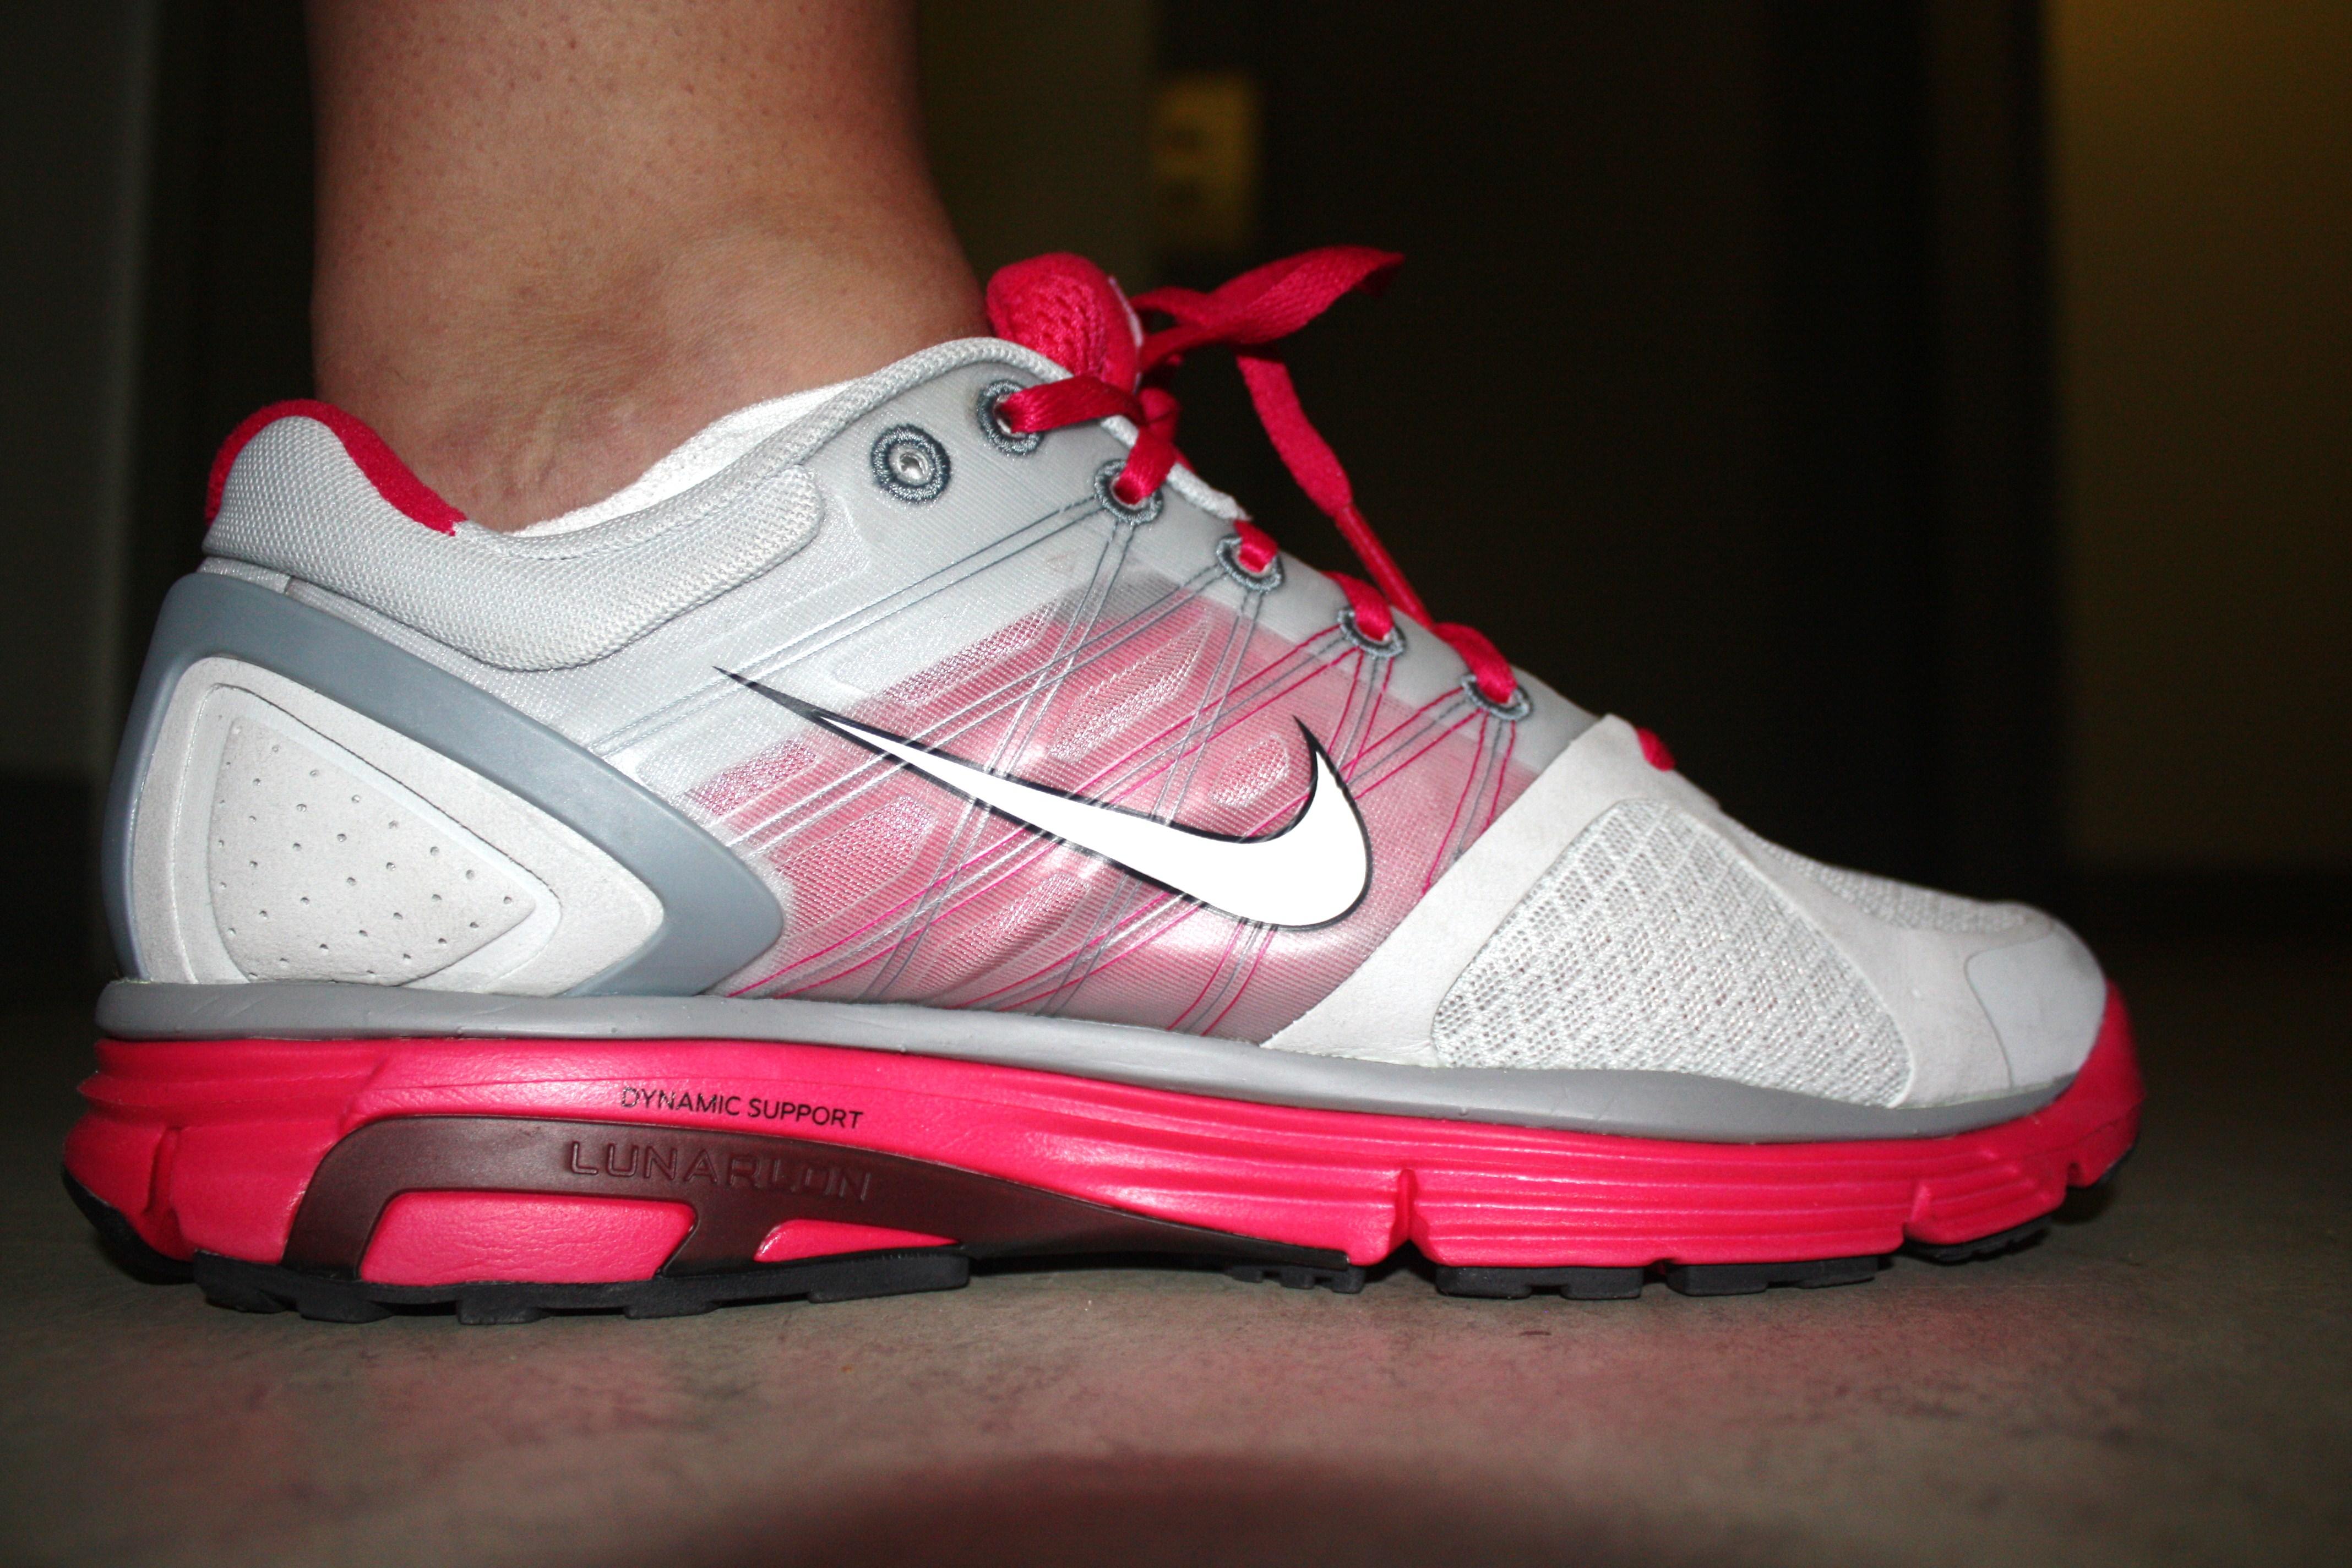 wholesale dealer 8734b e64cc Nike LunarGlide + 2 Women s ...